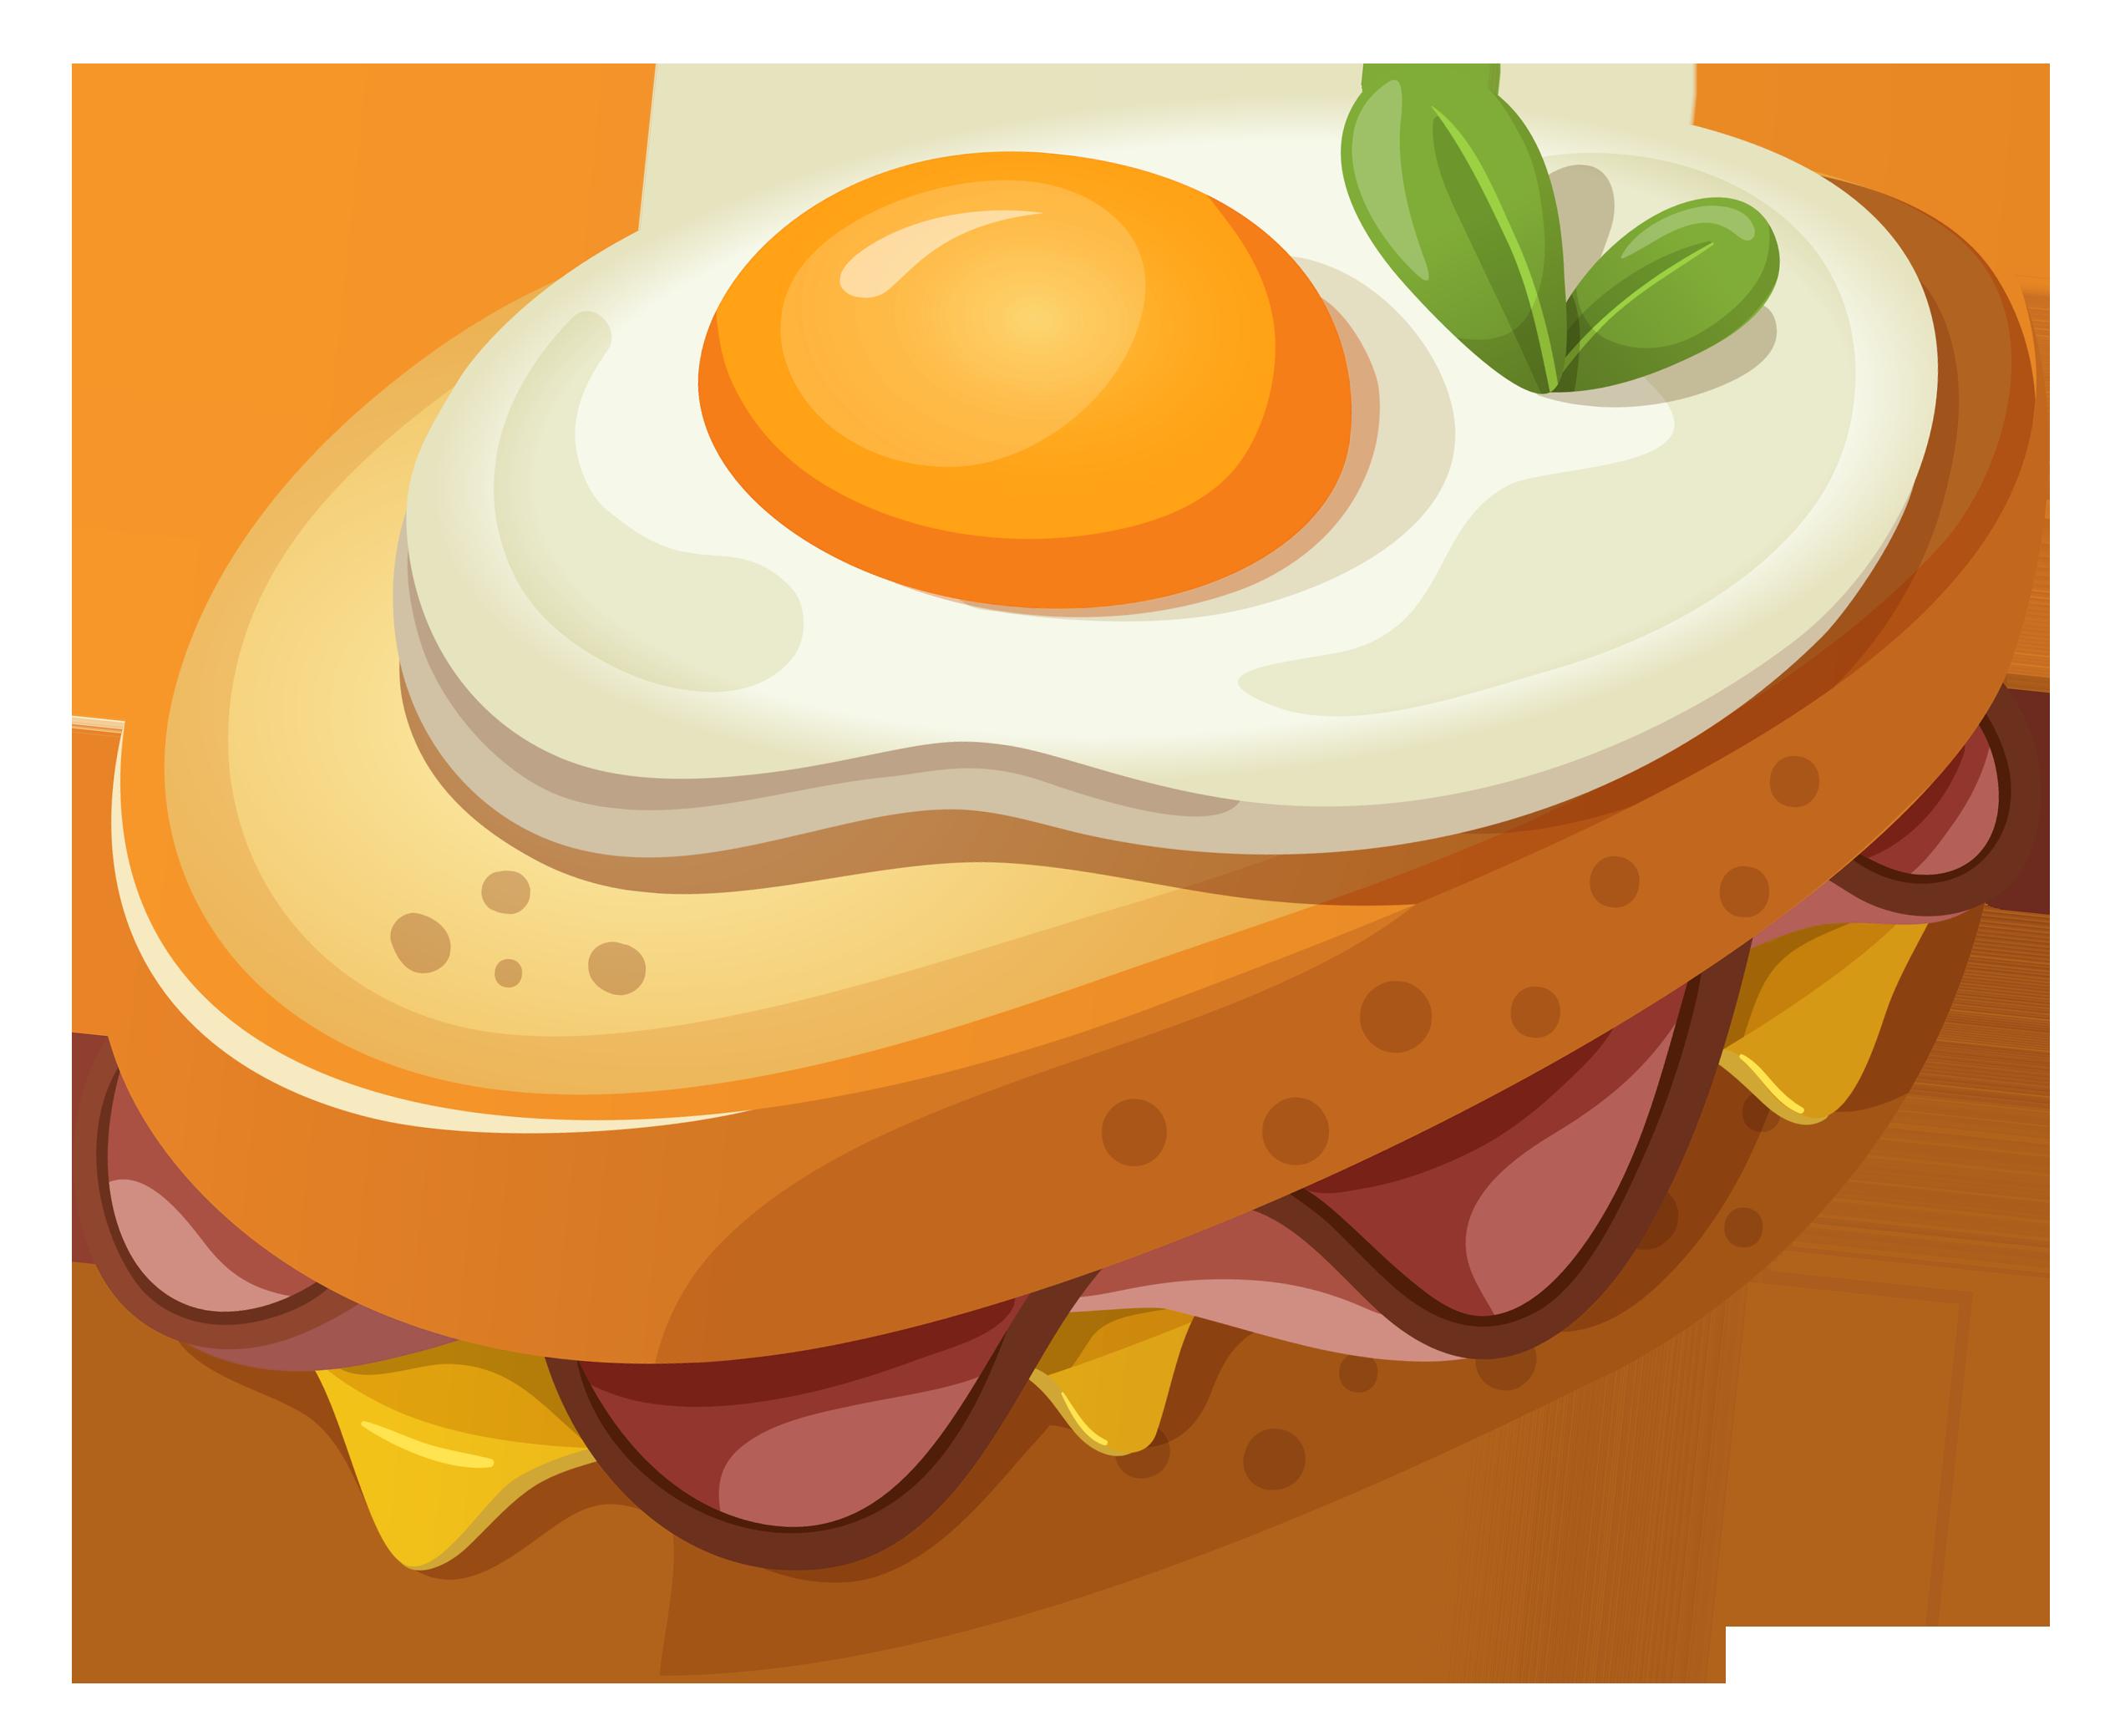 2526x2078 Fried Egg Clipart Egg Sandwich